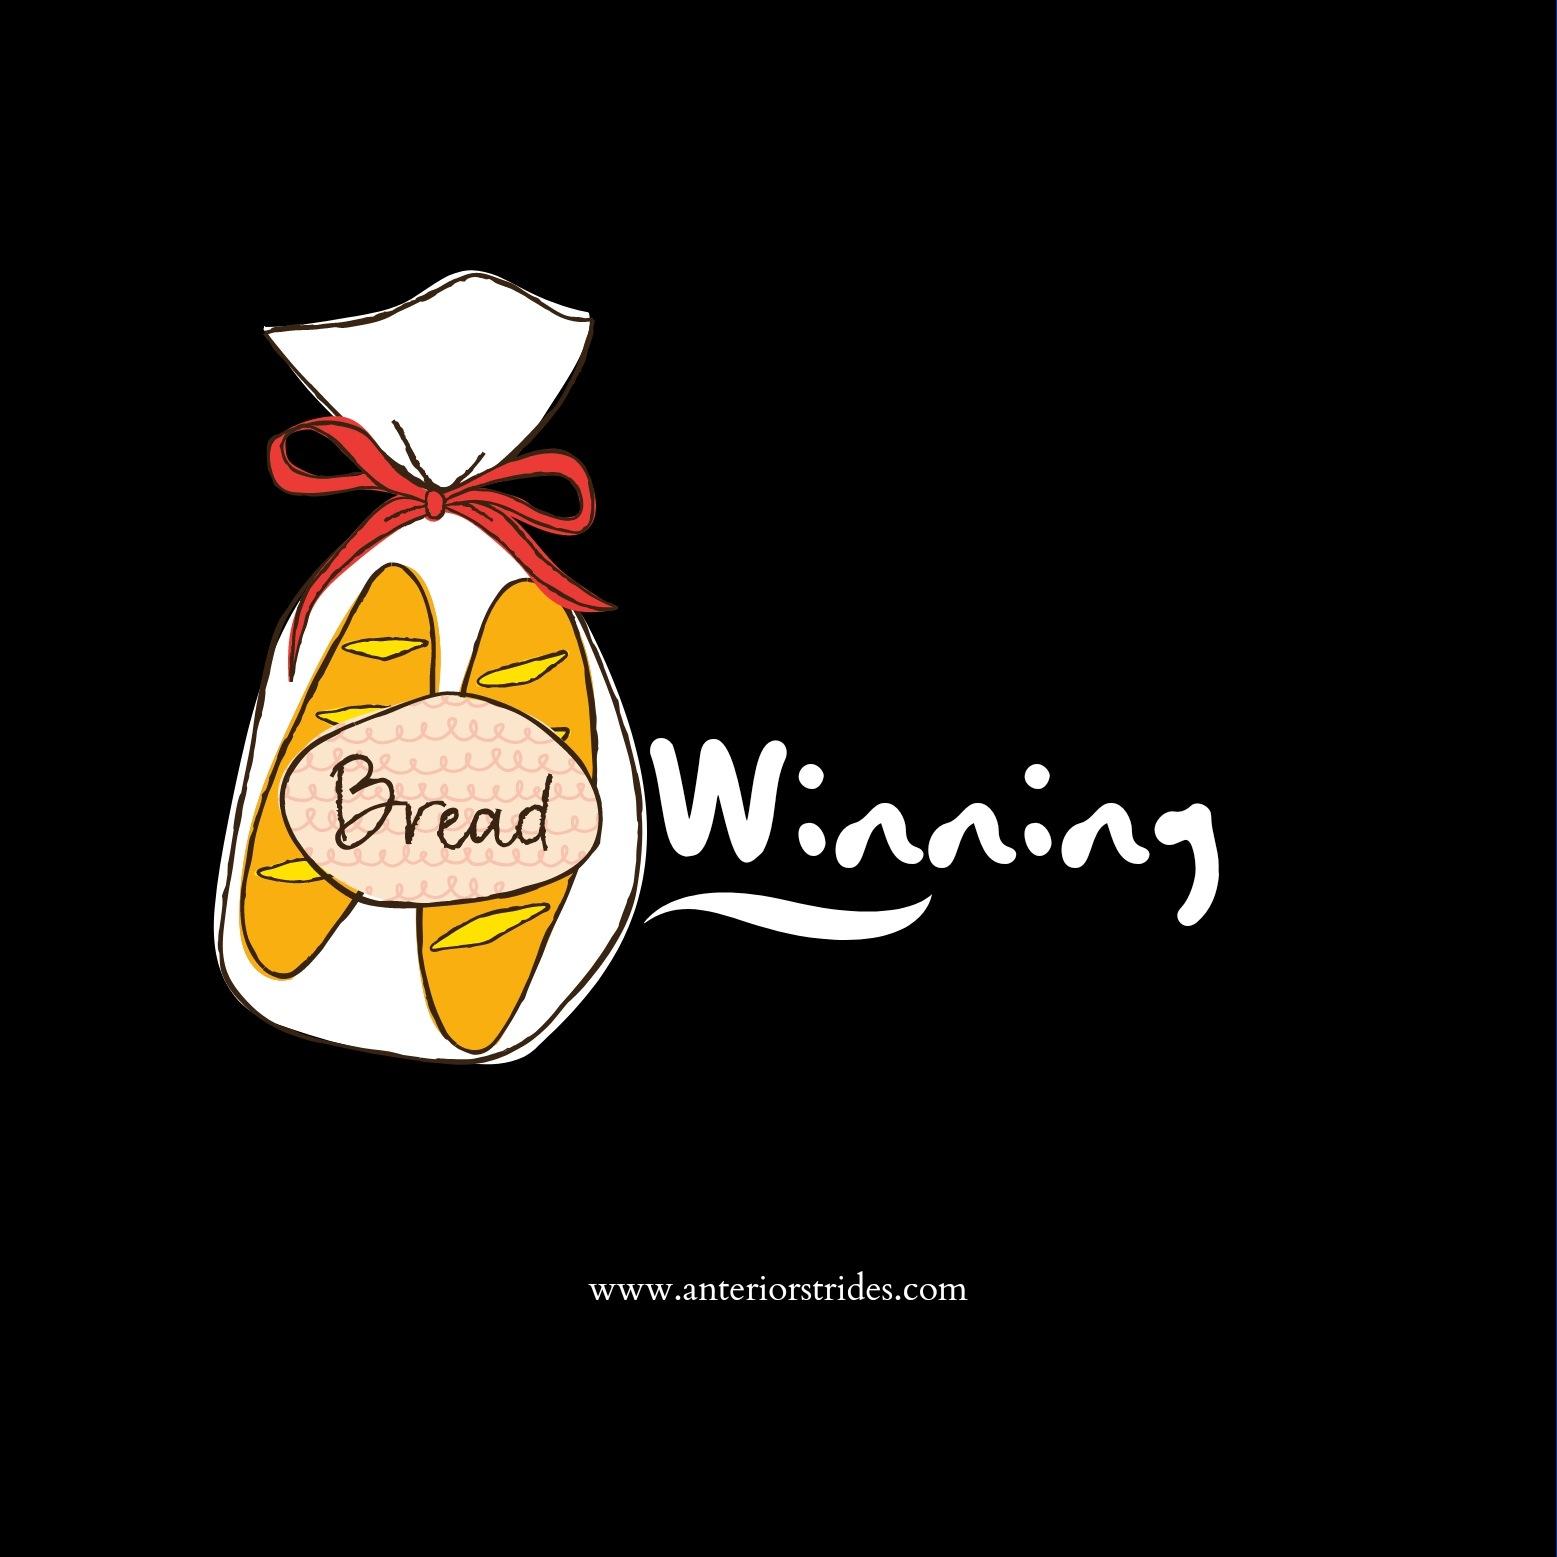 Bread Winning!